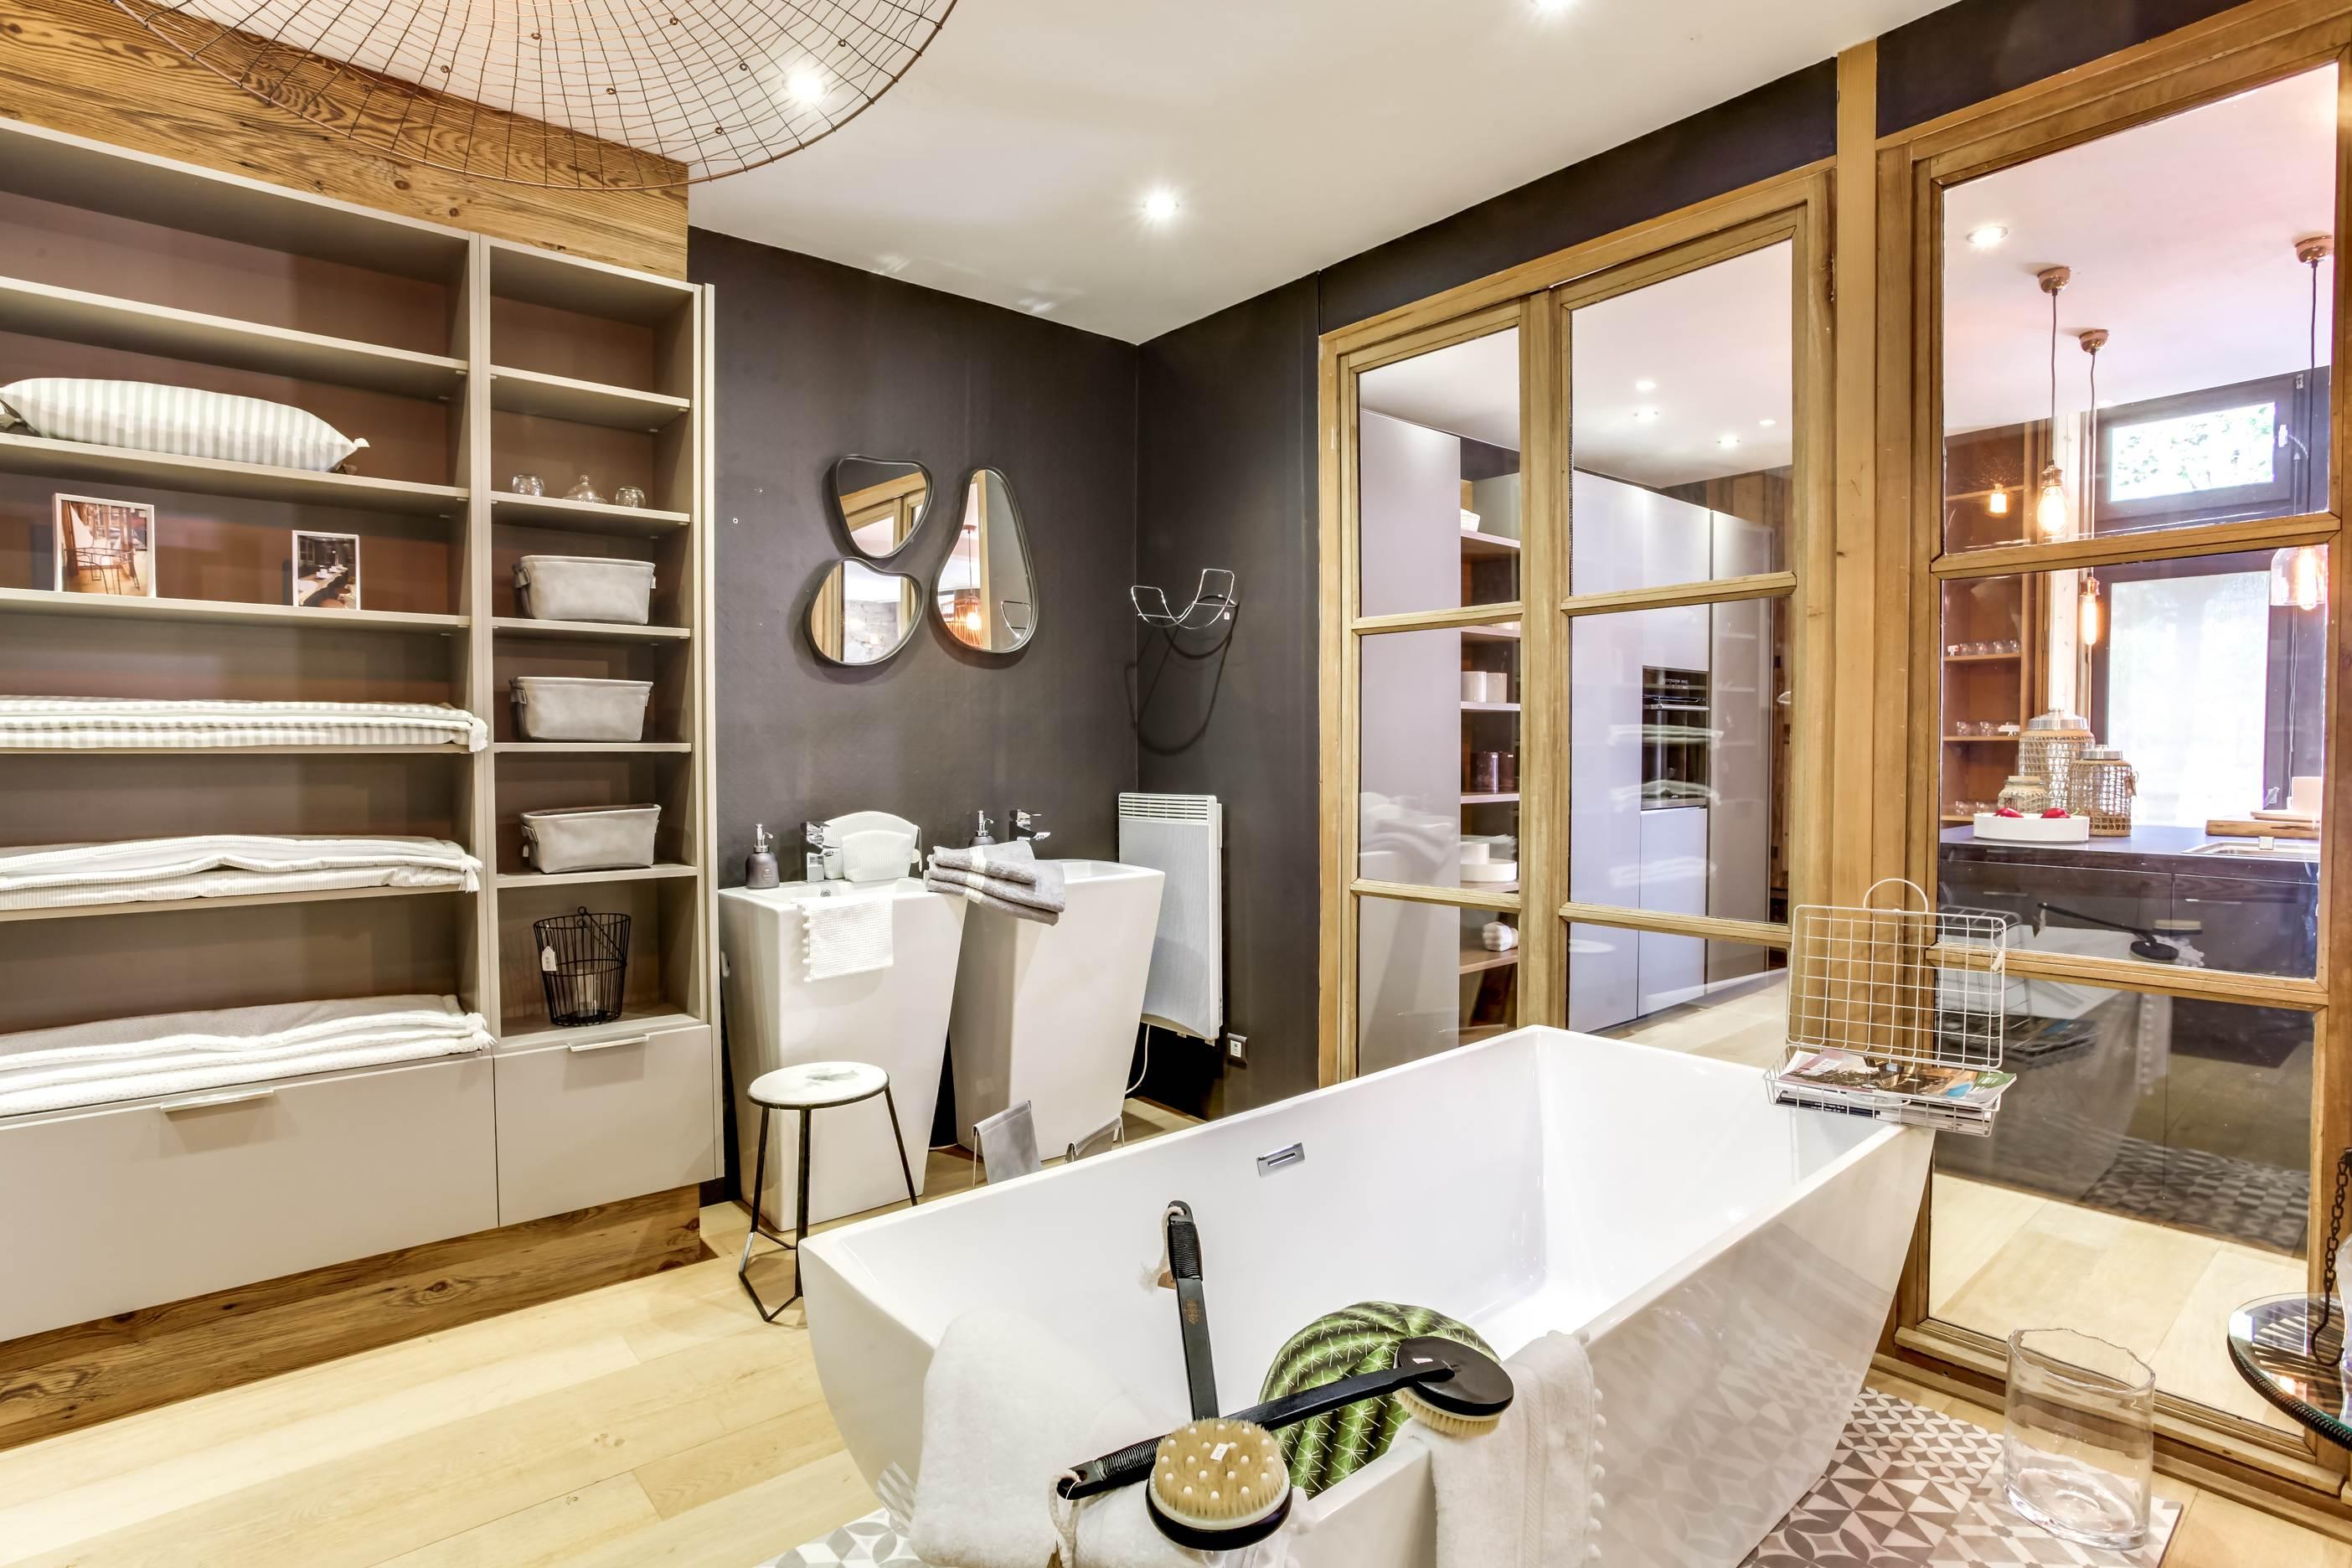 Showroom-bulles-cuisines-2017-salle-bain-2 - BULLES CUISINES